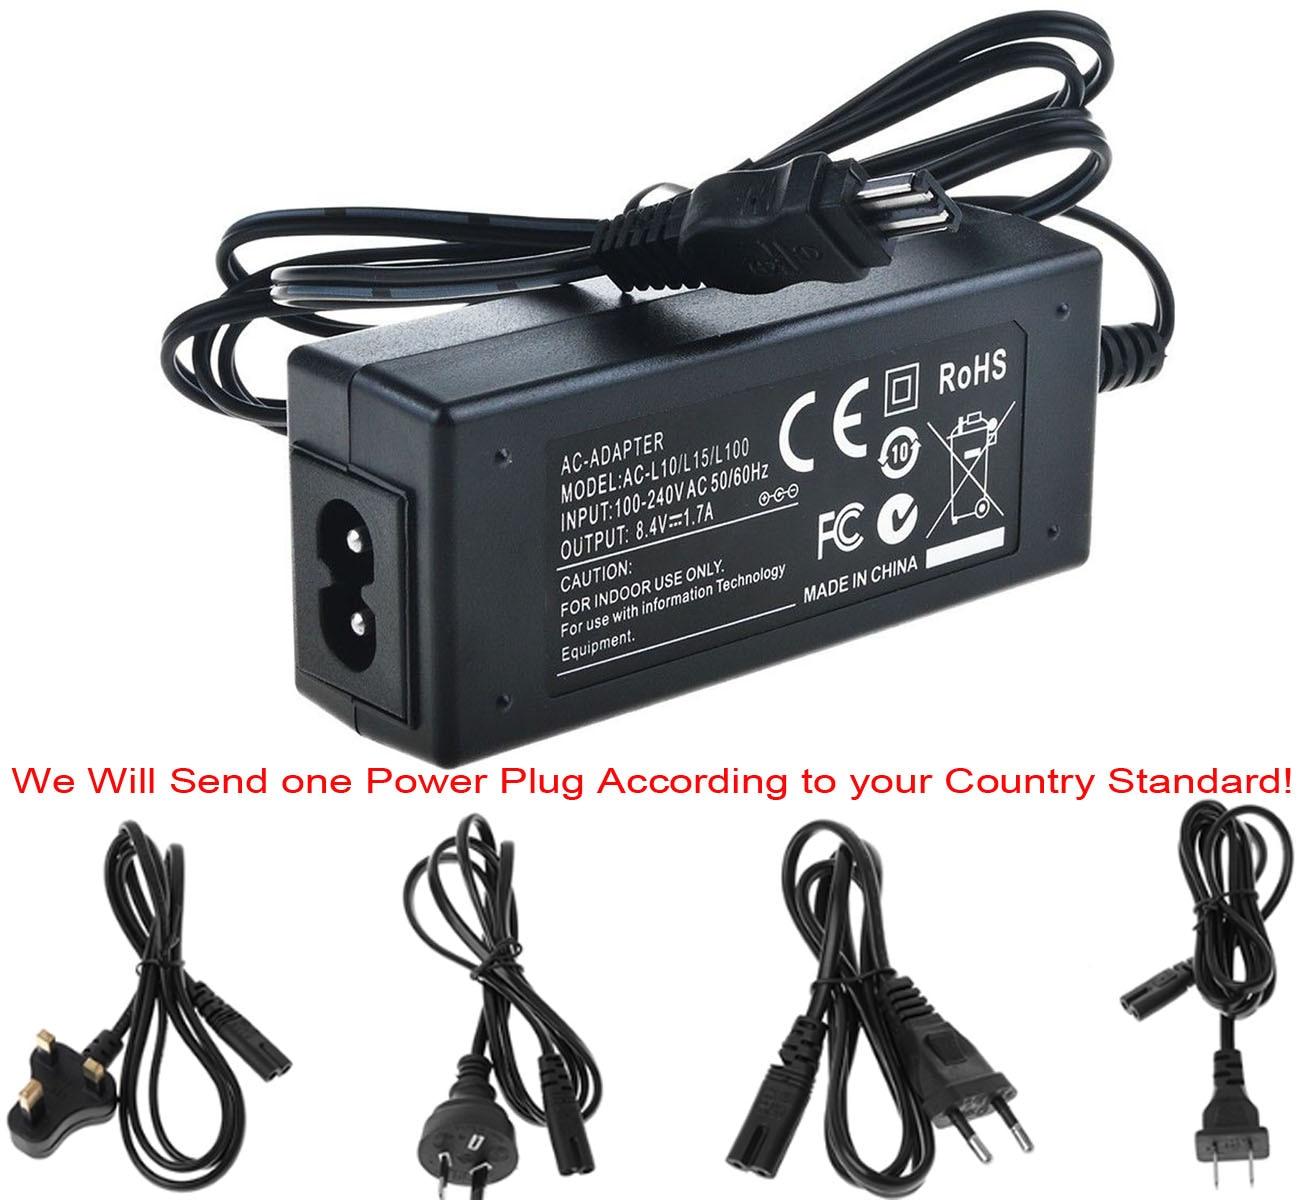 CCD-TR416E CCD-TR417E CCD-TR427E Handycam Camcorder USB Power Adapter Charger for Sony CCD-TR415E CCD-TR425E